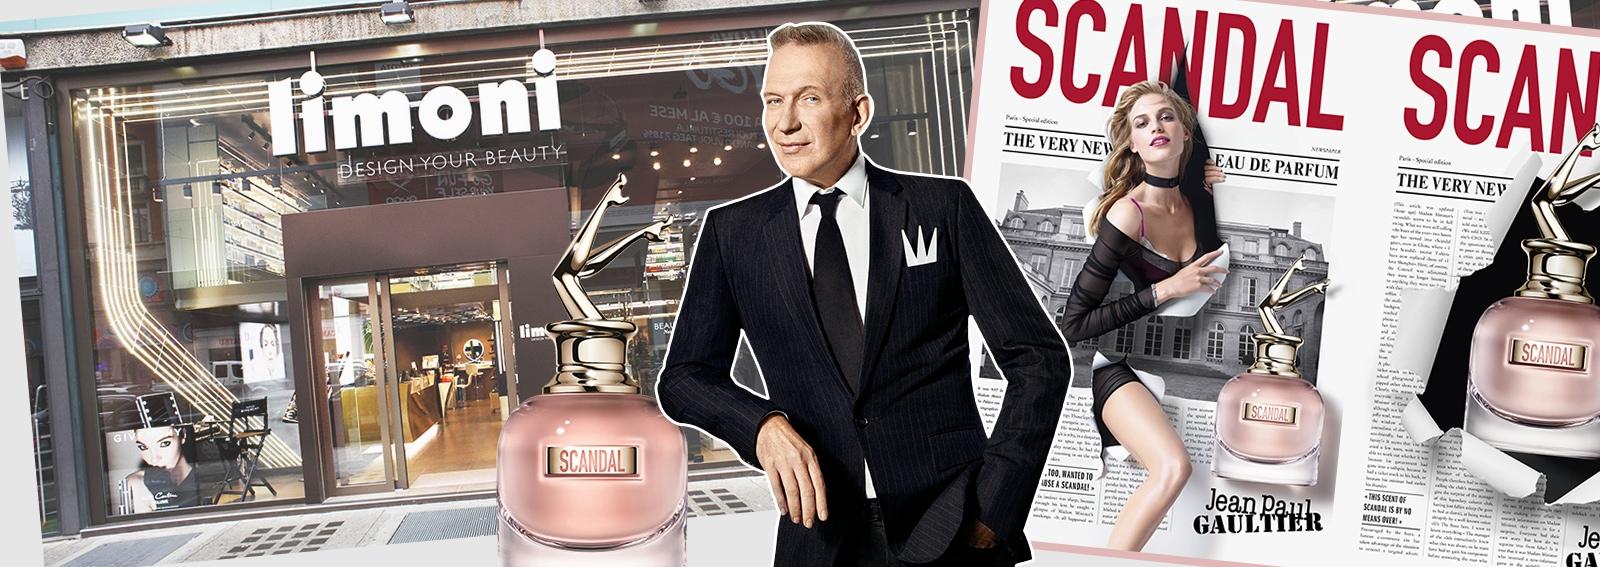 jean paul gaultier scandal cover DESKTOP_scandal